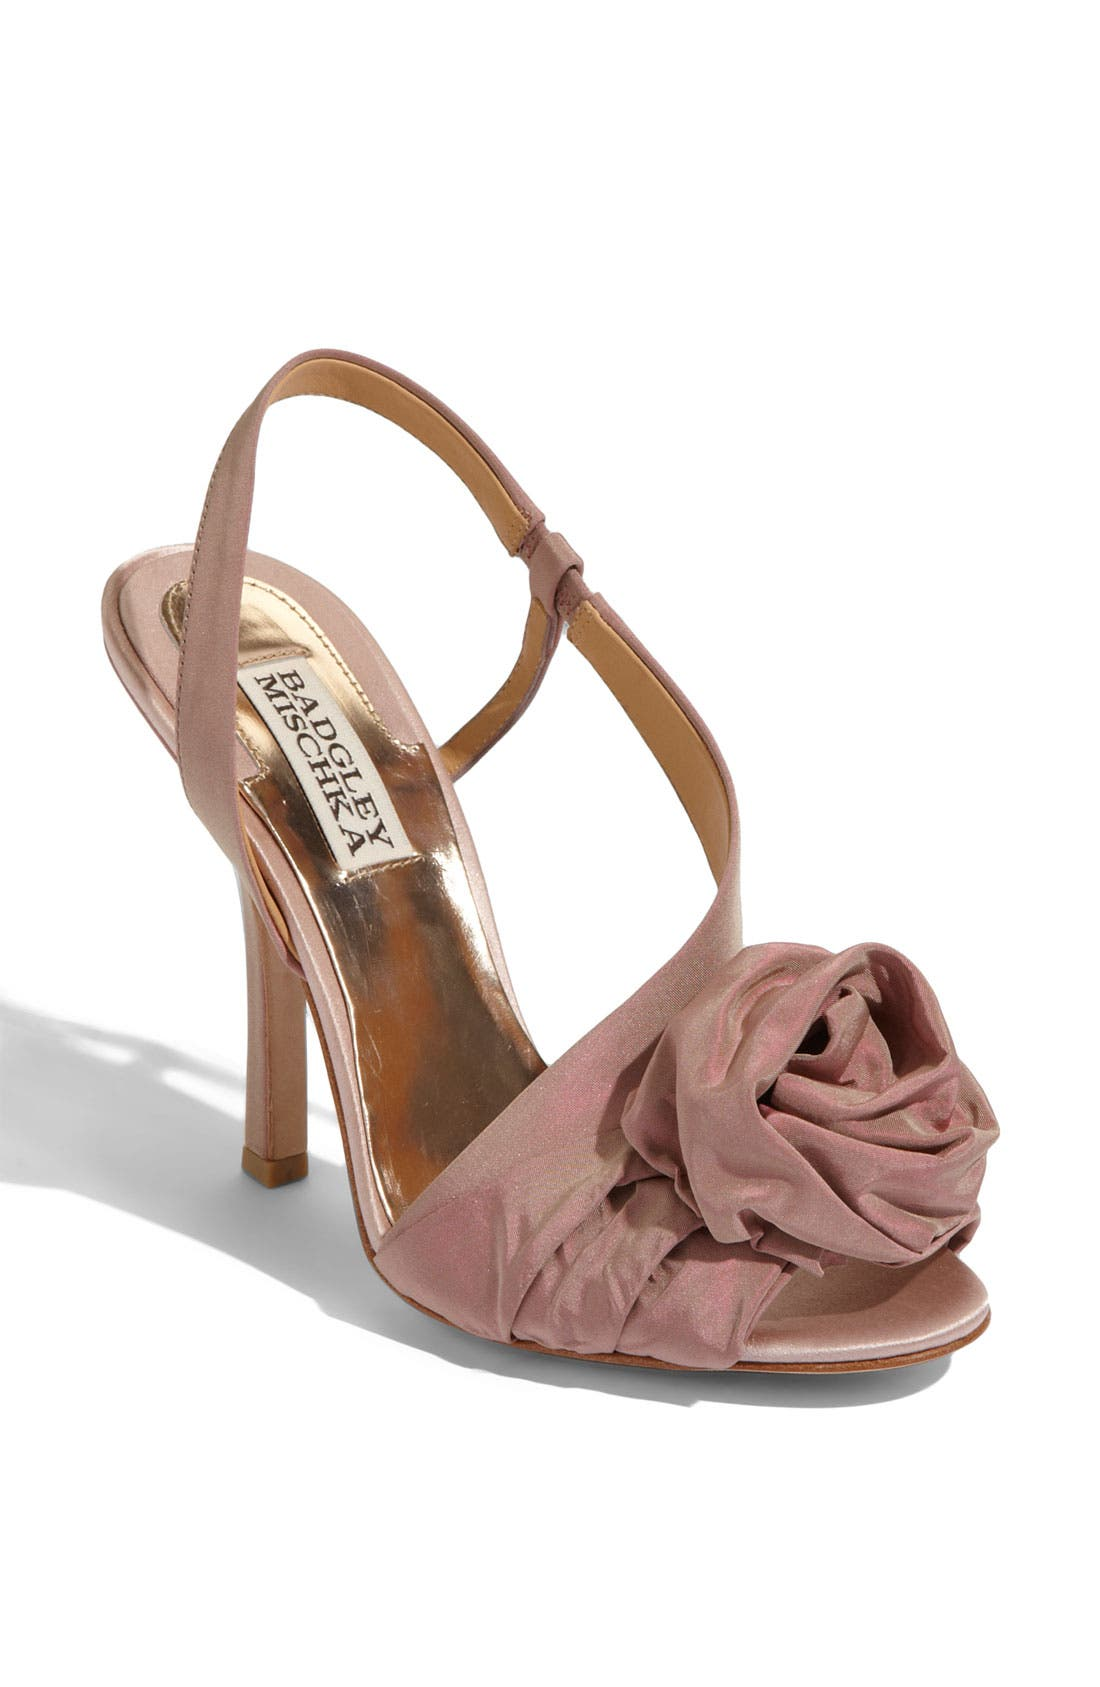 Alternate Image 1 Selected - Badgley Mischka 'Lanah' Sandal